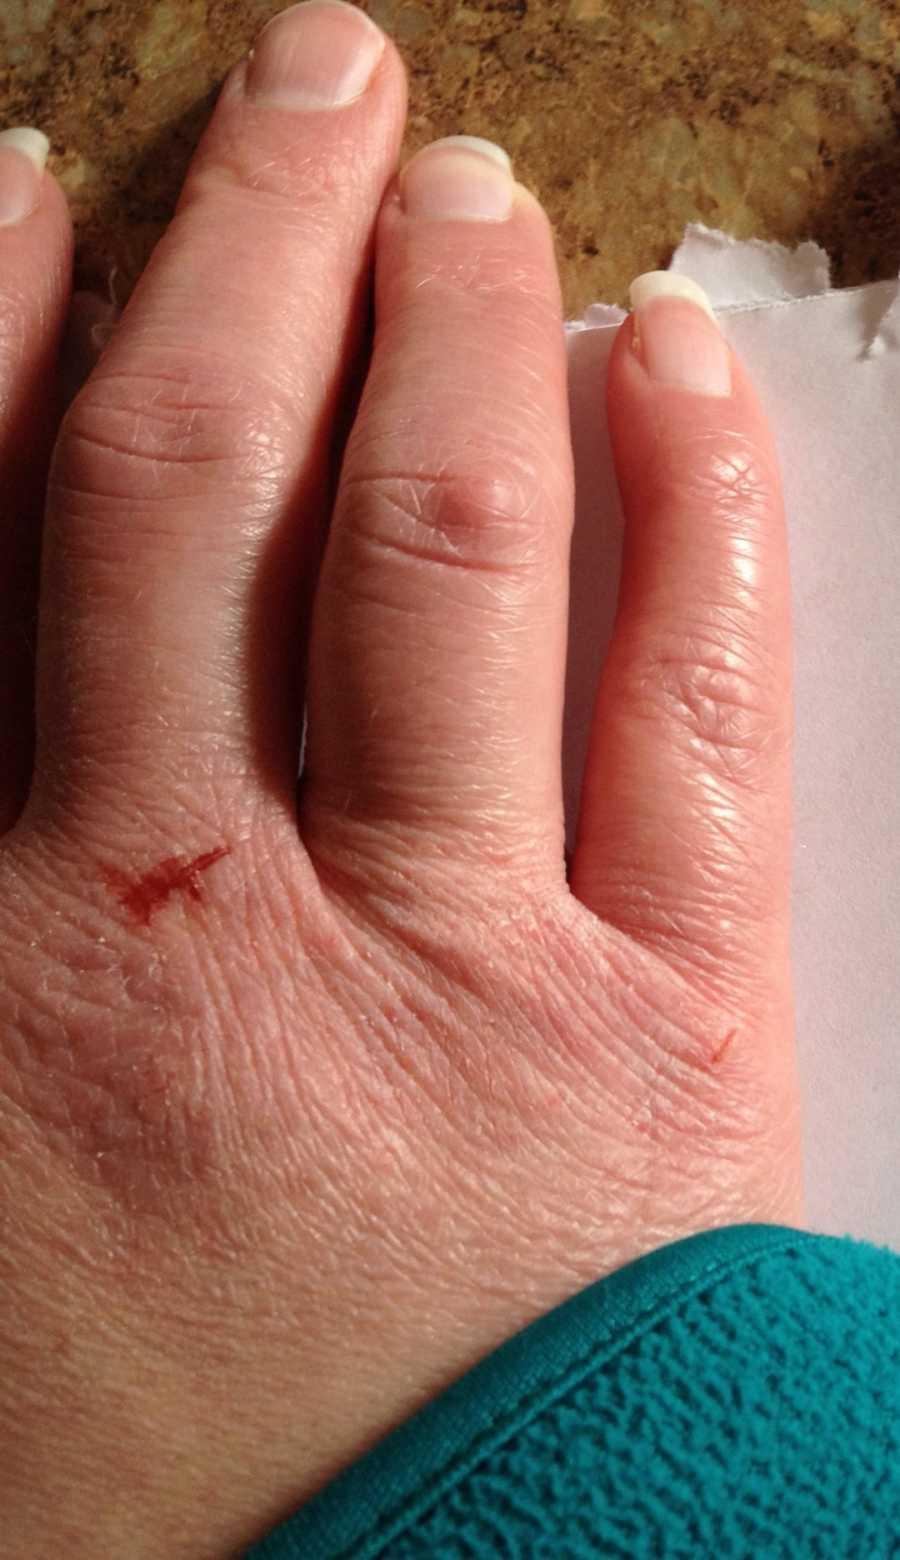 lupus hands in winter